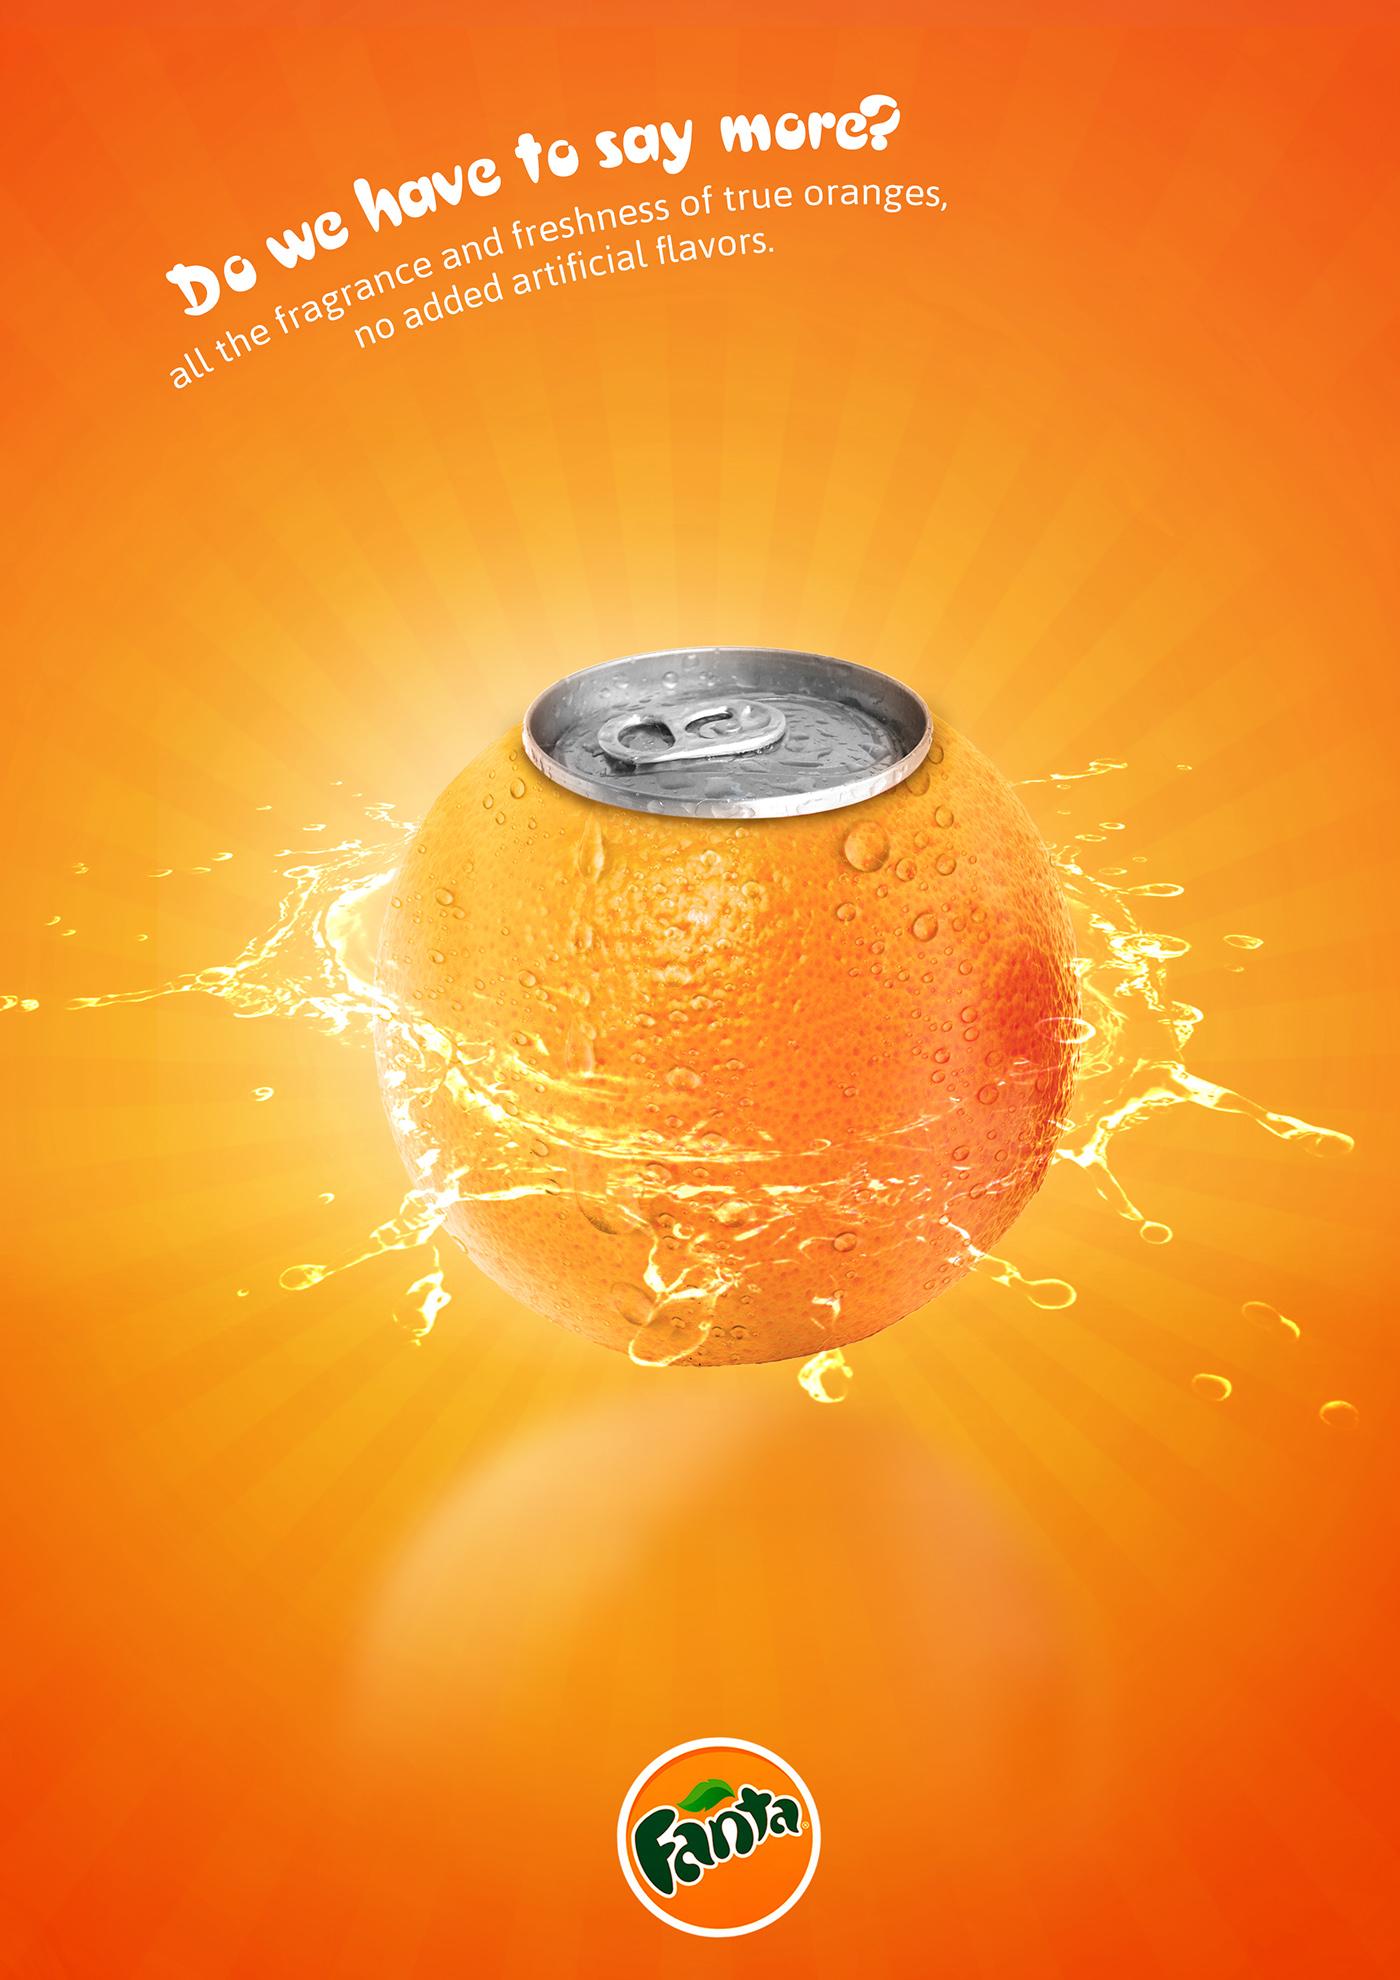 Fanta print ad - There's no need to say more